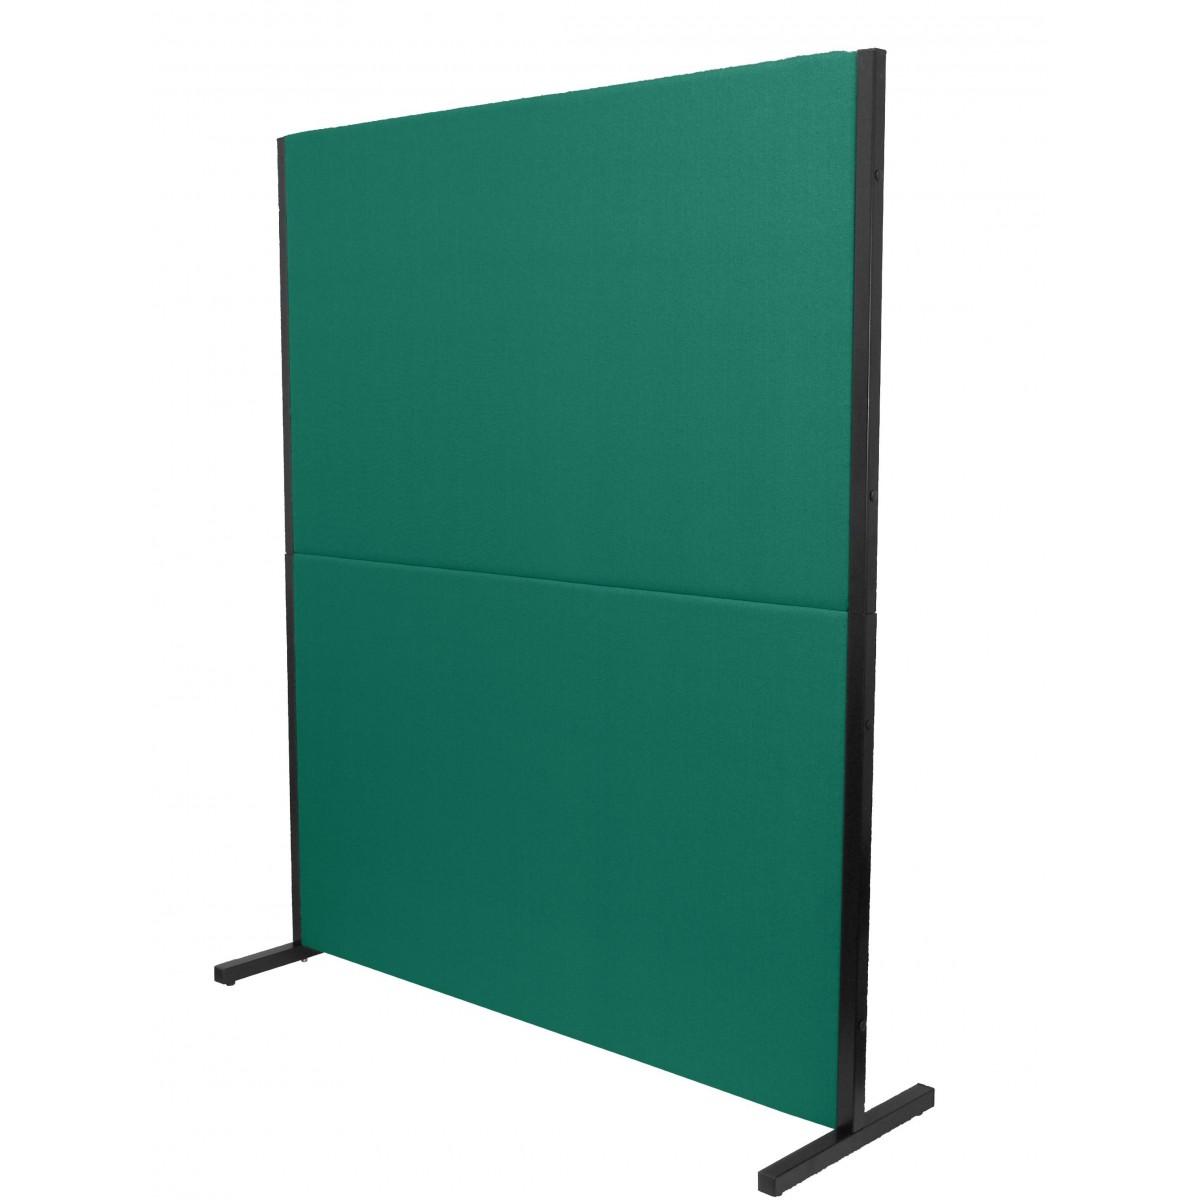 biombo acustico textil verde